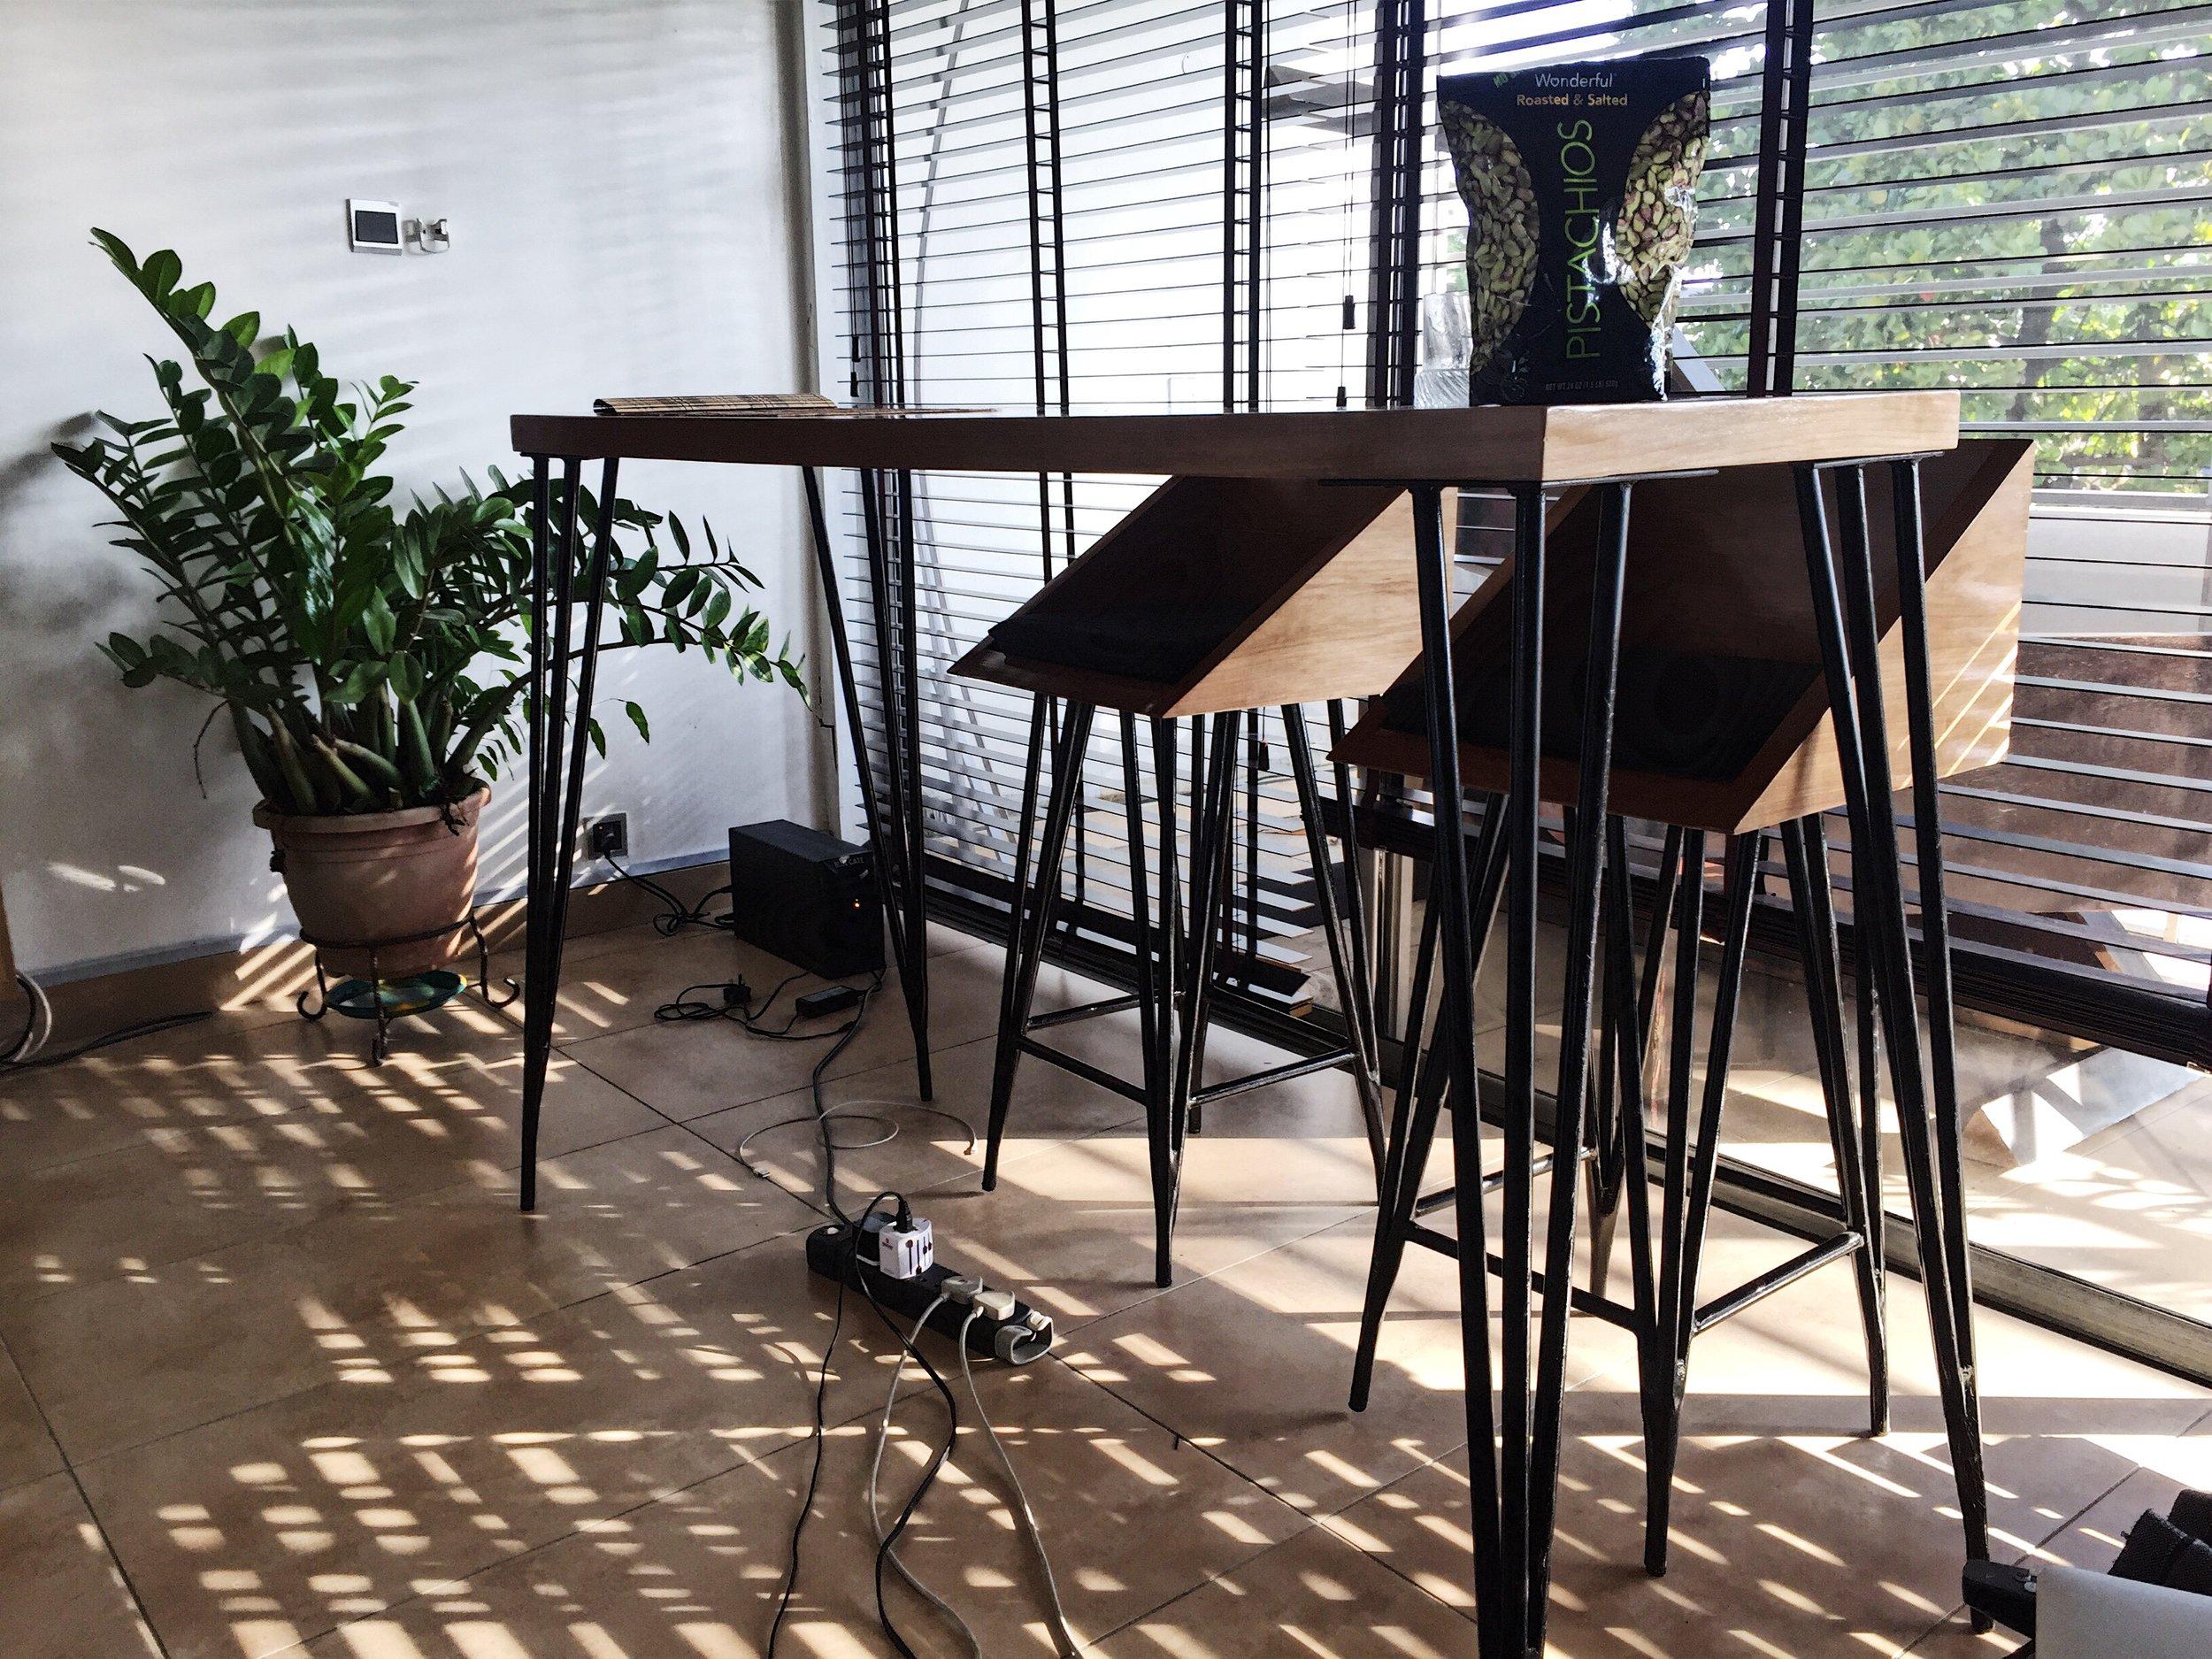 BAR TABLE + STOOLS.JPG